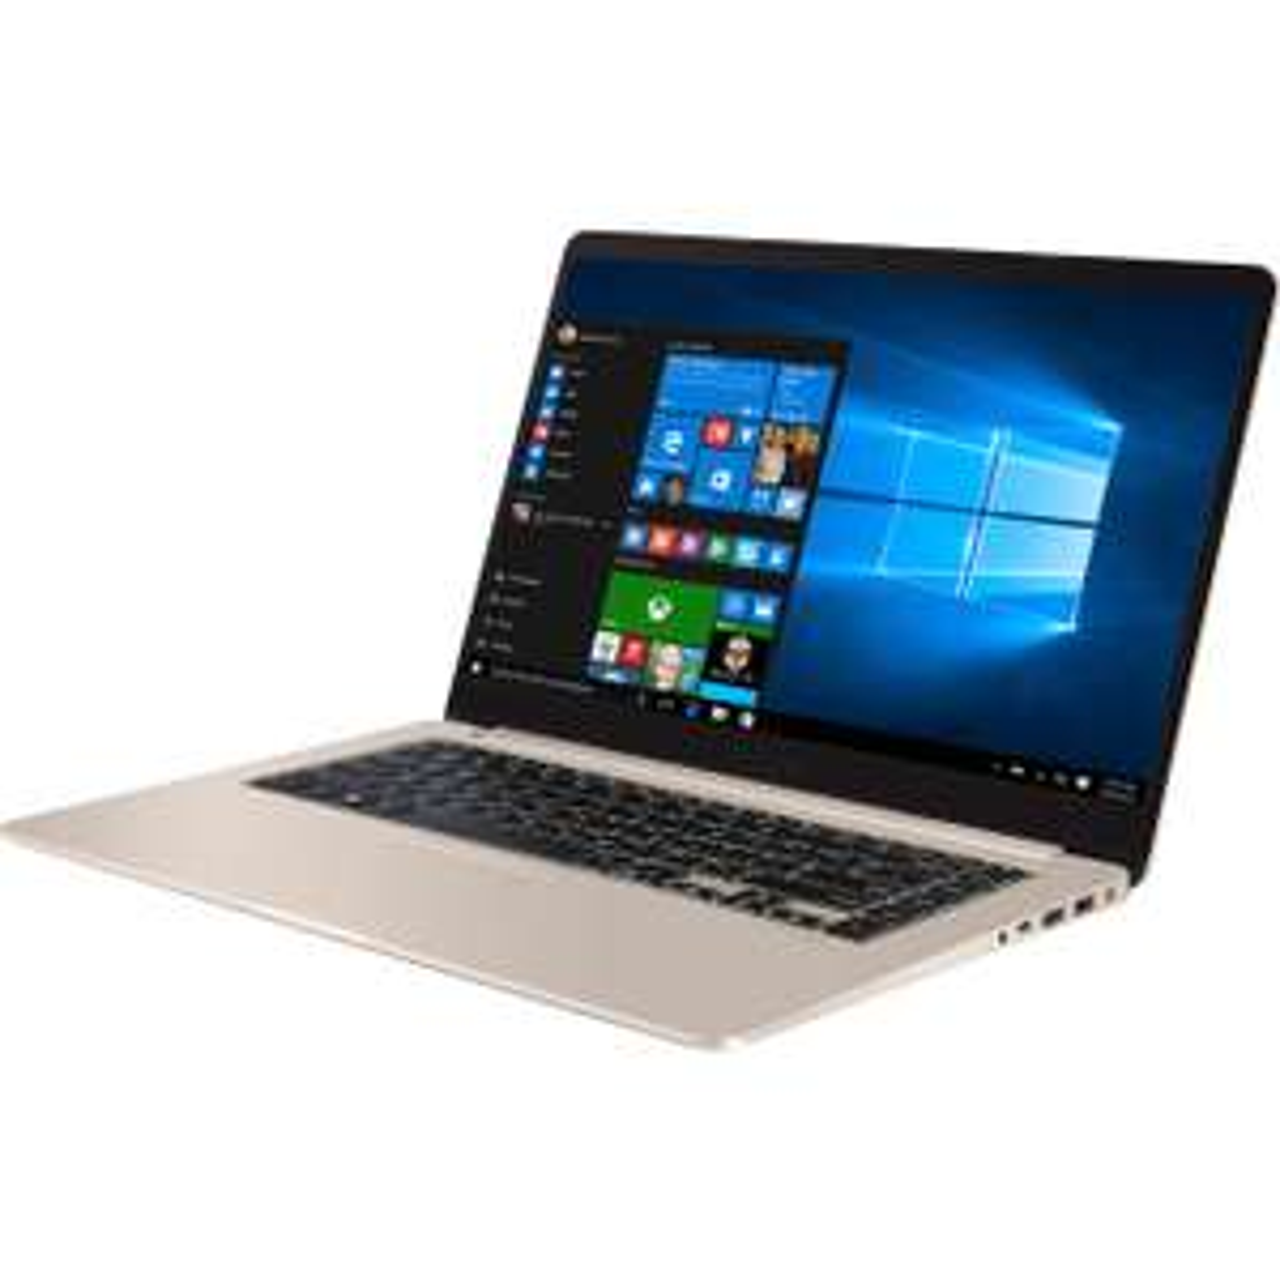 "Asus i3 15.6"" Full HD, i3 7, 128gb ssd, 8gb ram, fingerprint rdr. As good as a Macbook for half the price. - £599 @ AO. Poss £549"